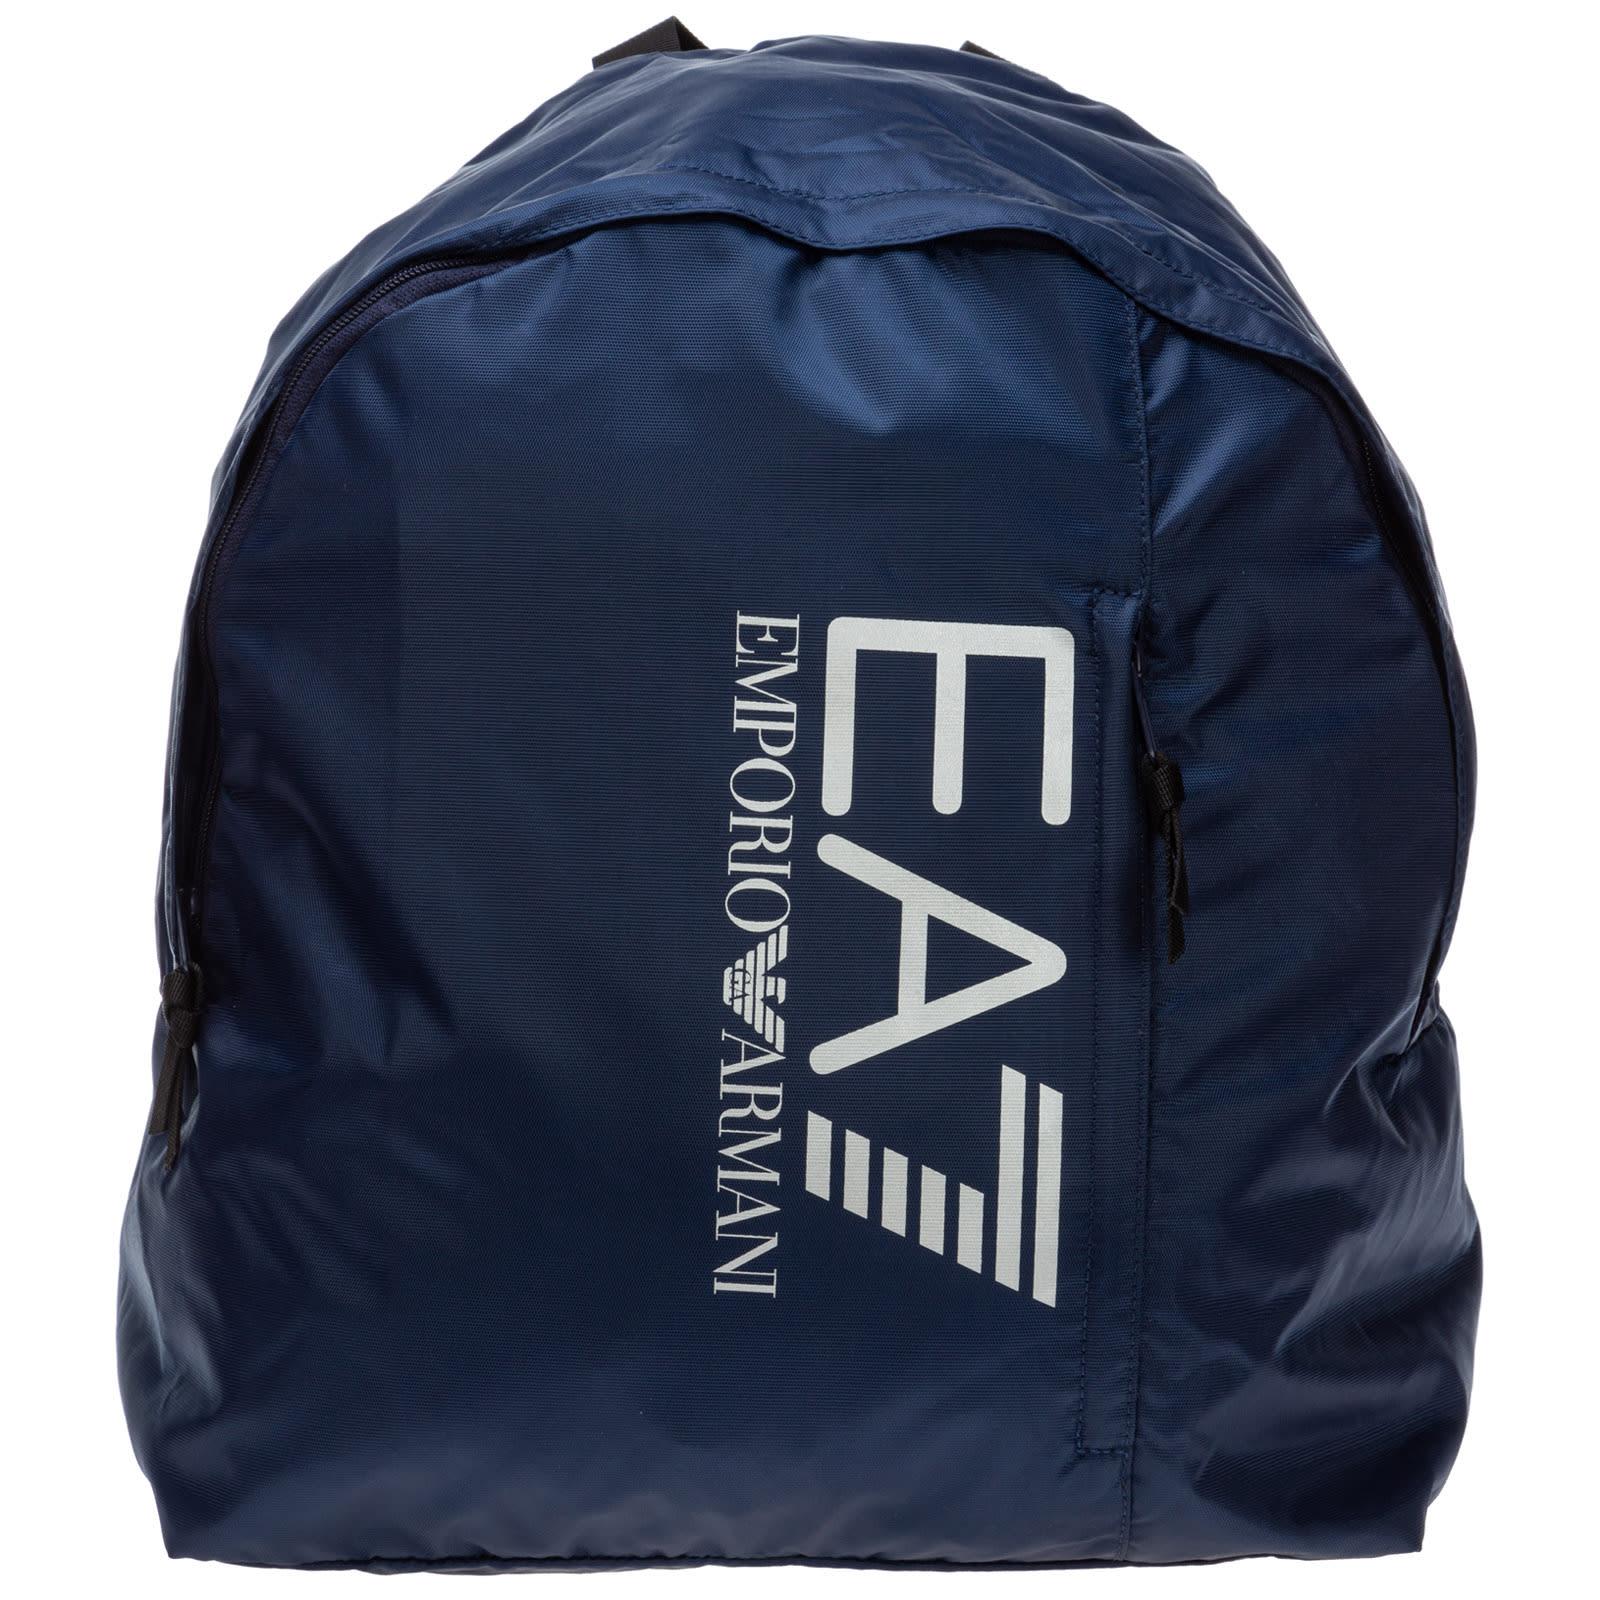 Emporio Armani Ea7 Dober-man Backpack